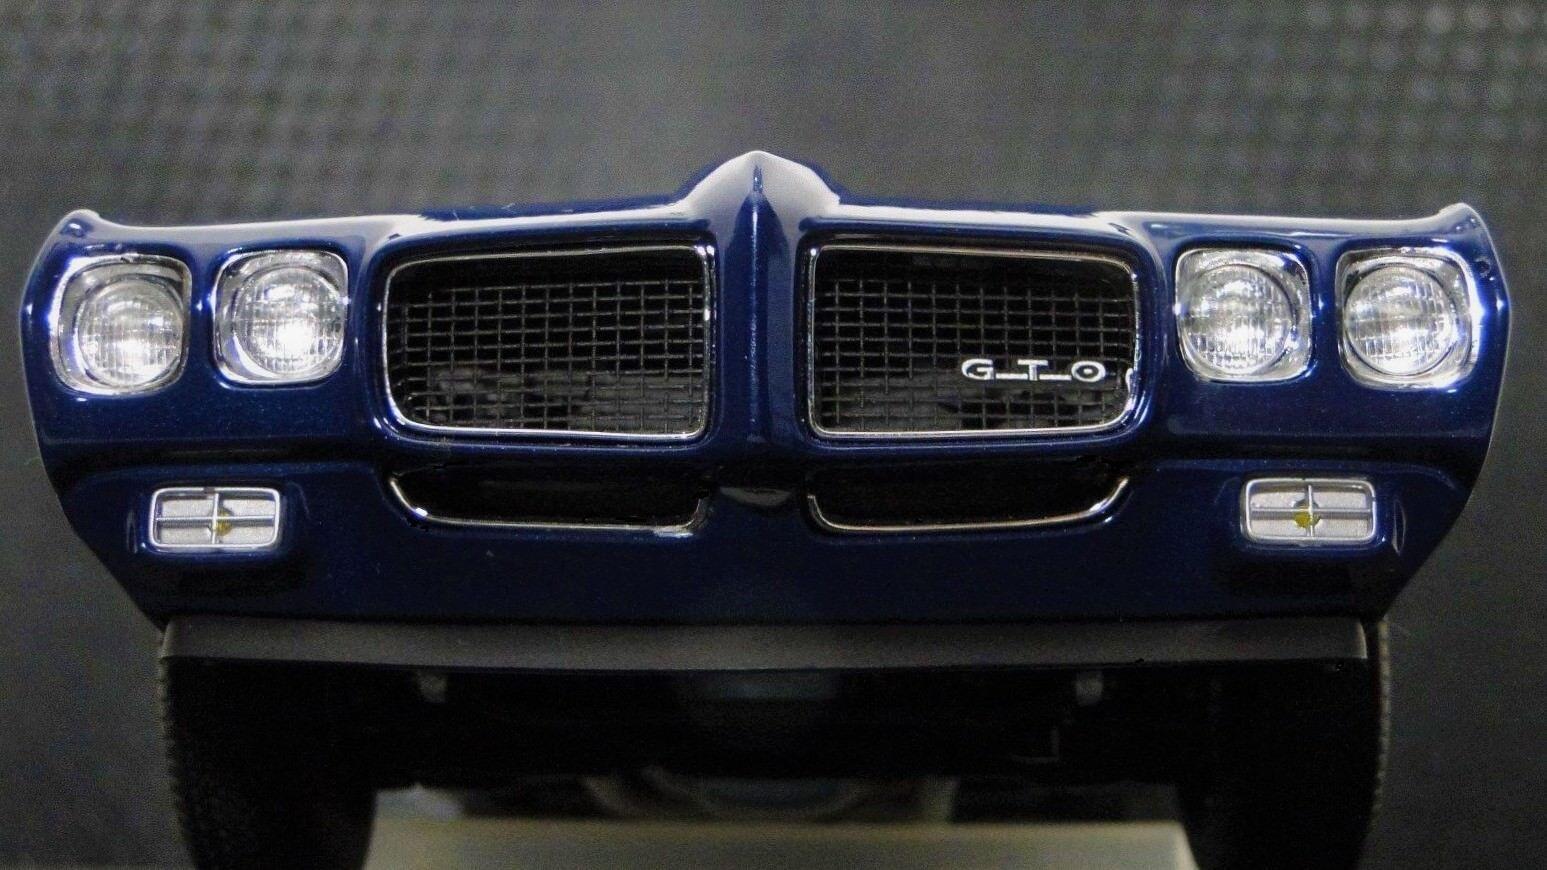 Pontiac GTO 1970s Muscle Car 1 18 Hot Rod Race Dragster Carousel bluee Model 24